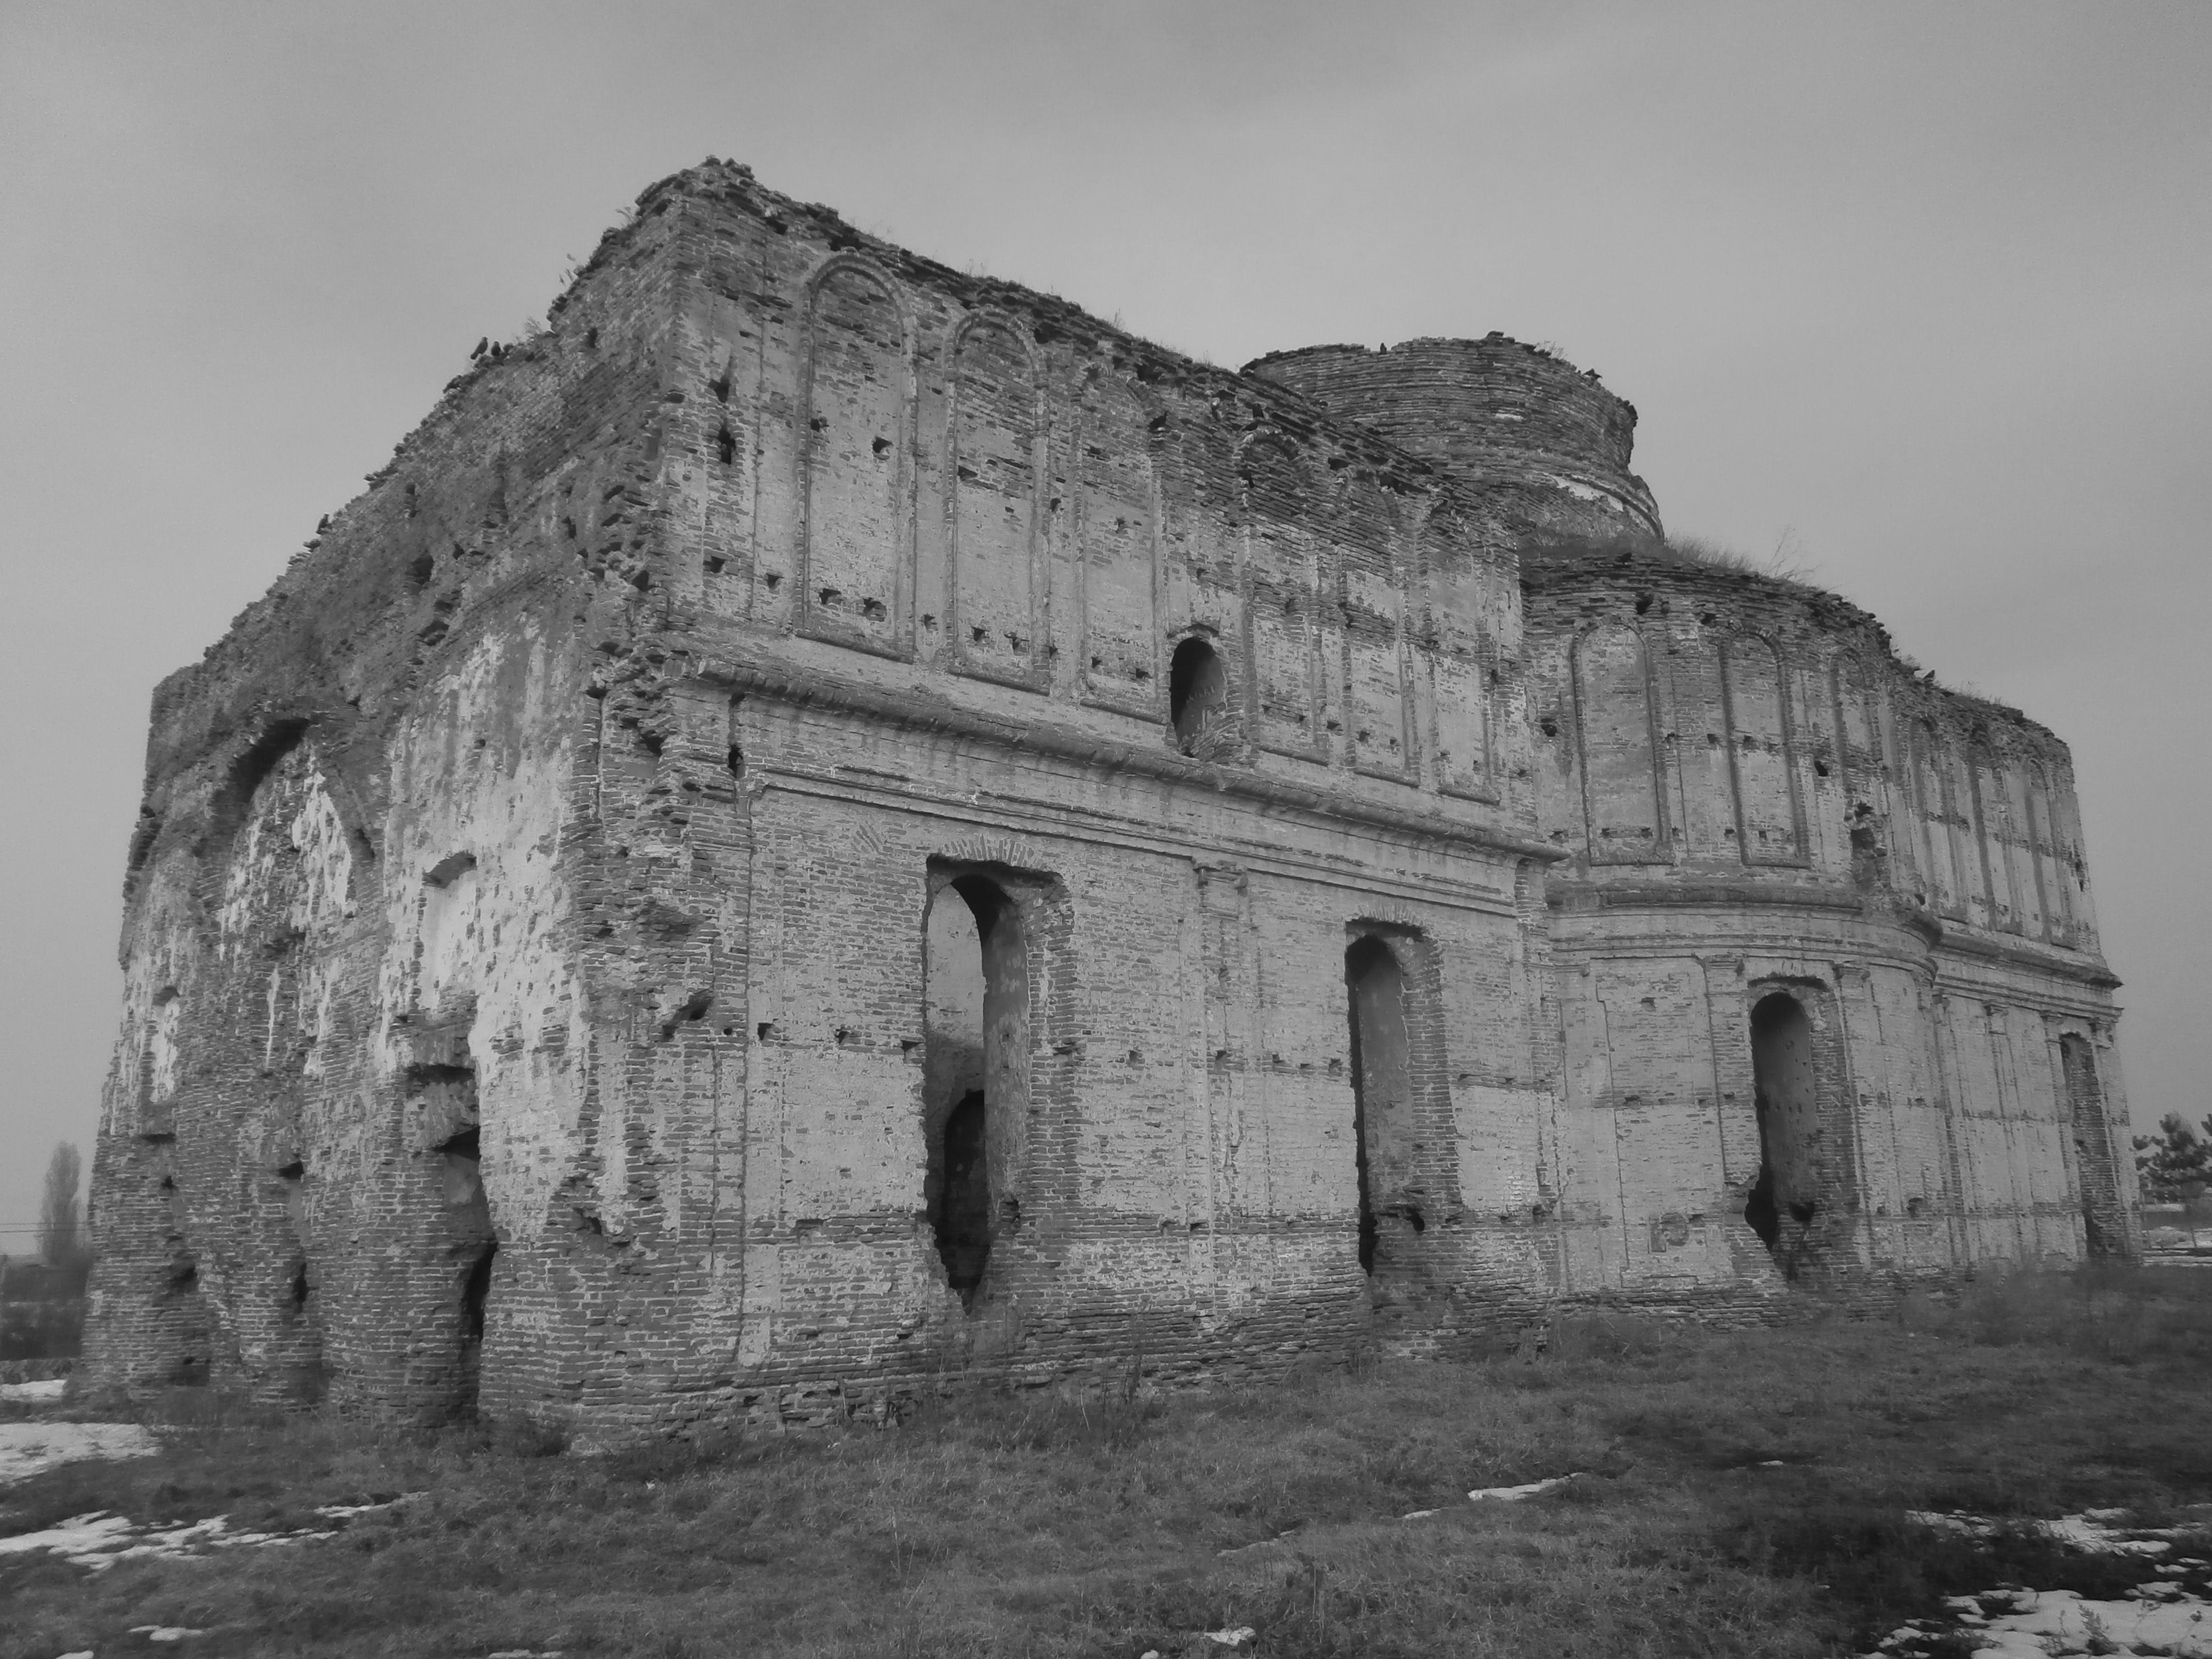 Mânăstirea Chiajna